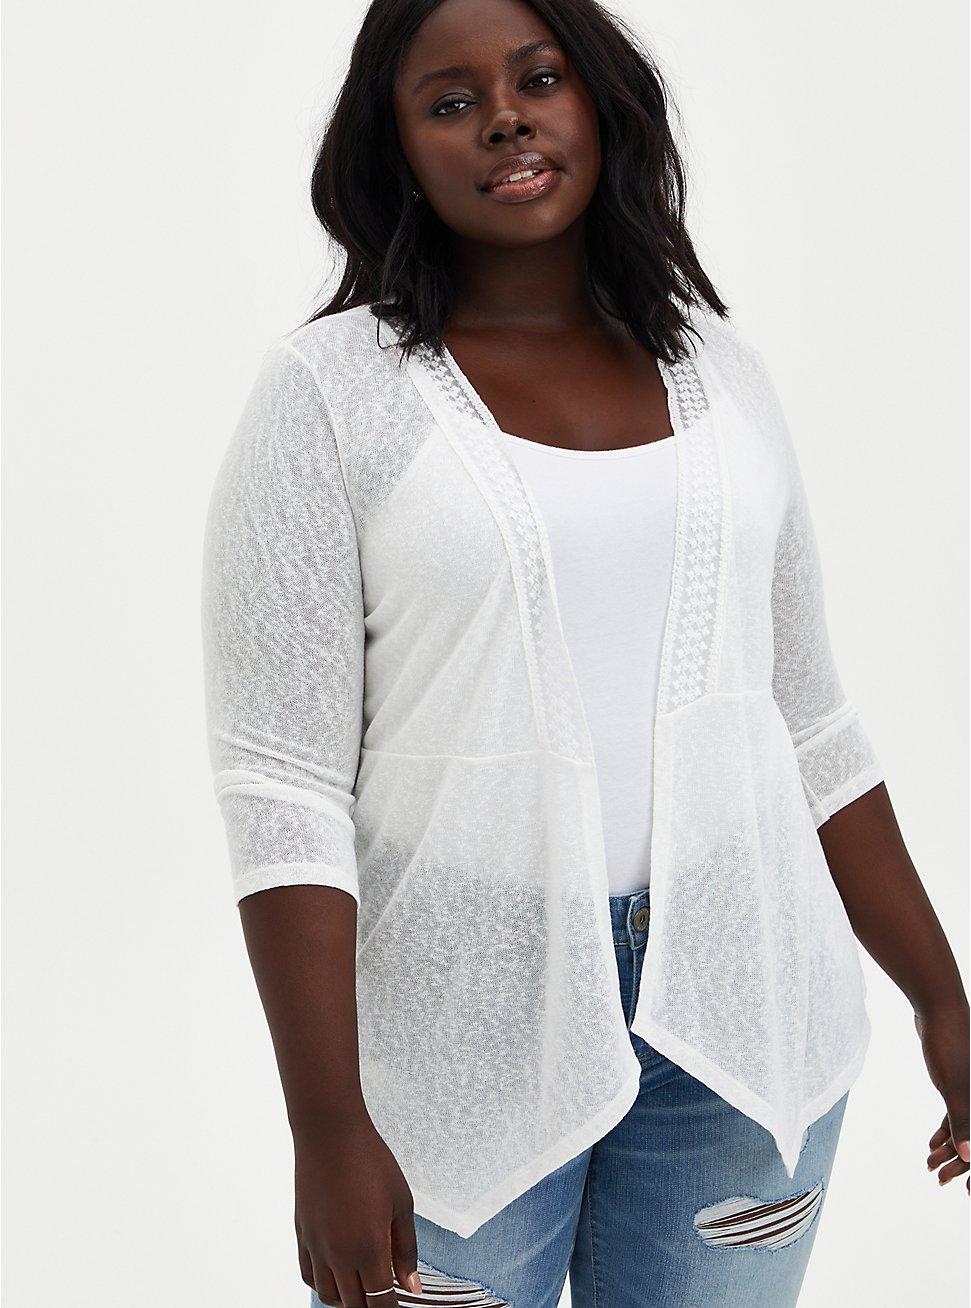 White Lace Knit Cardigan, IVORY, hi-res